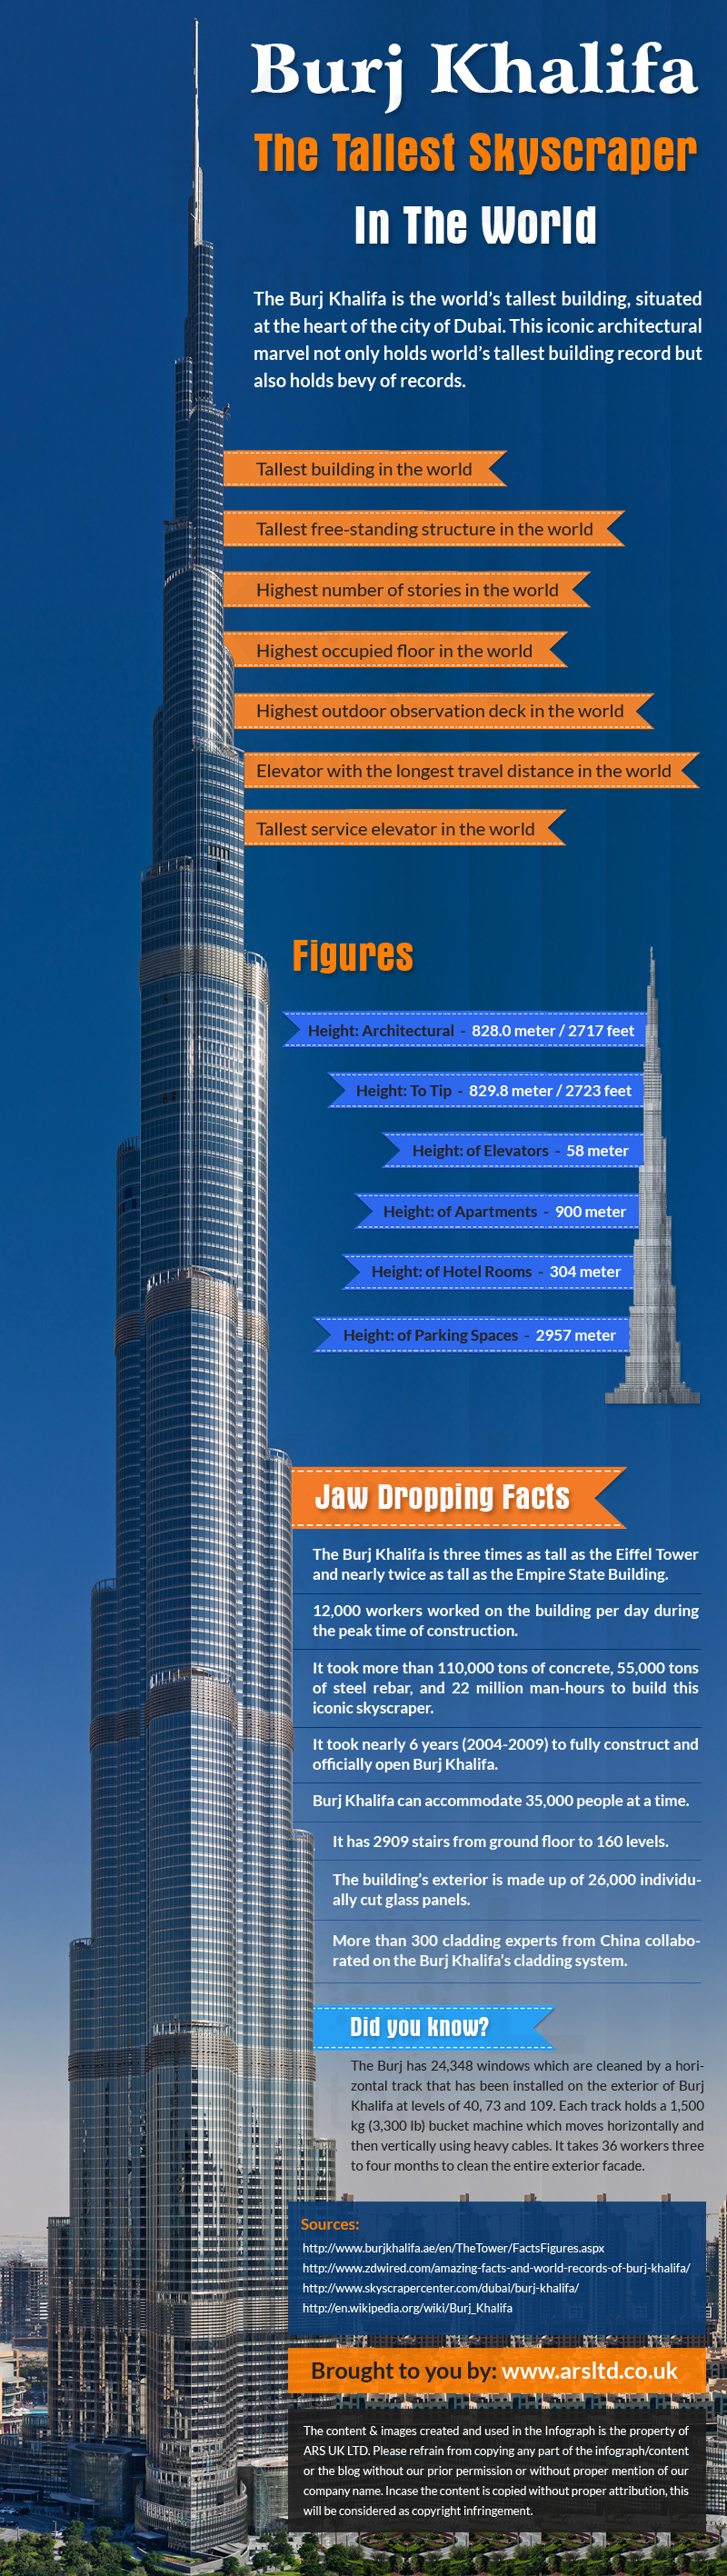 Burj Khalifa: The Tallest Skyscraper In The World | Information ...